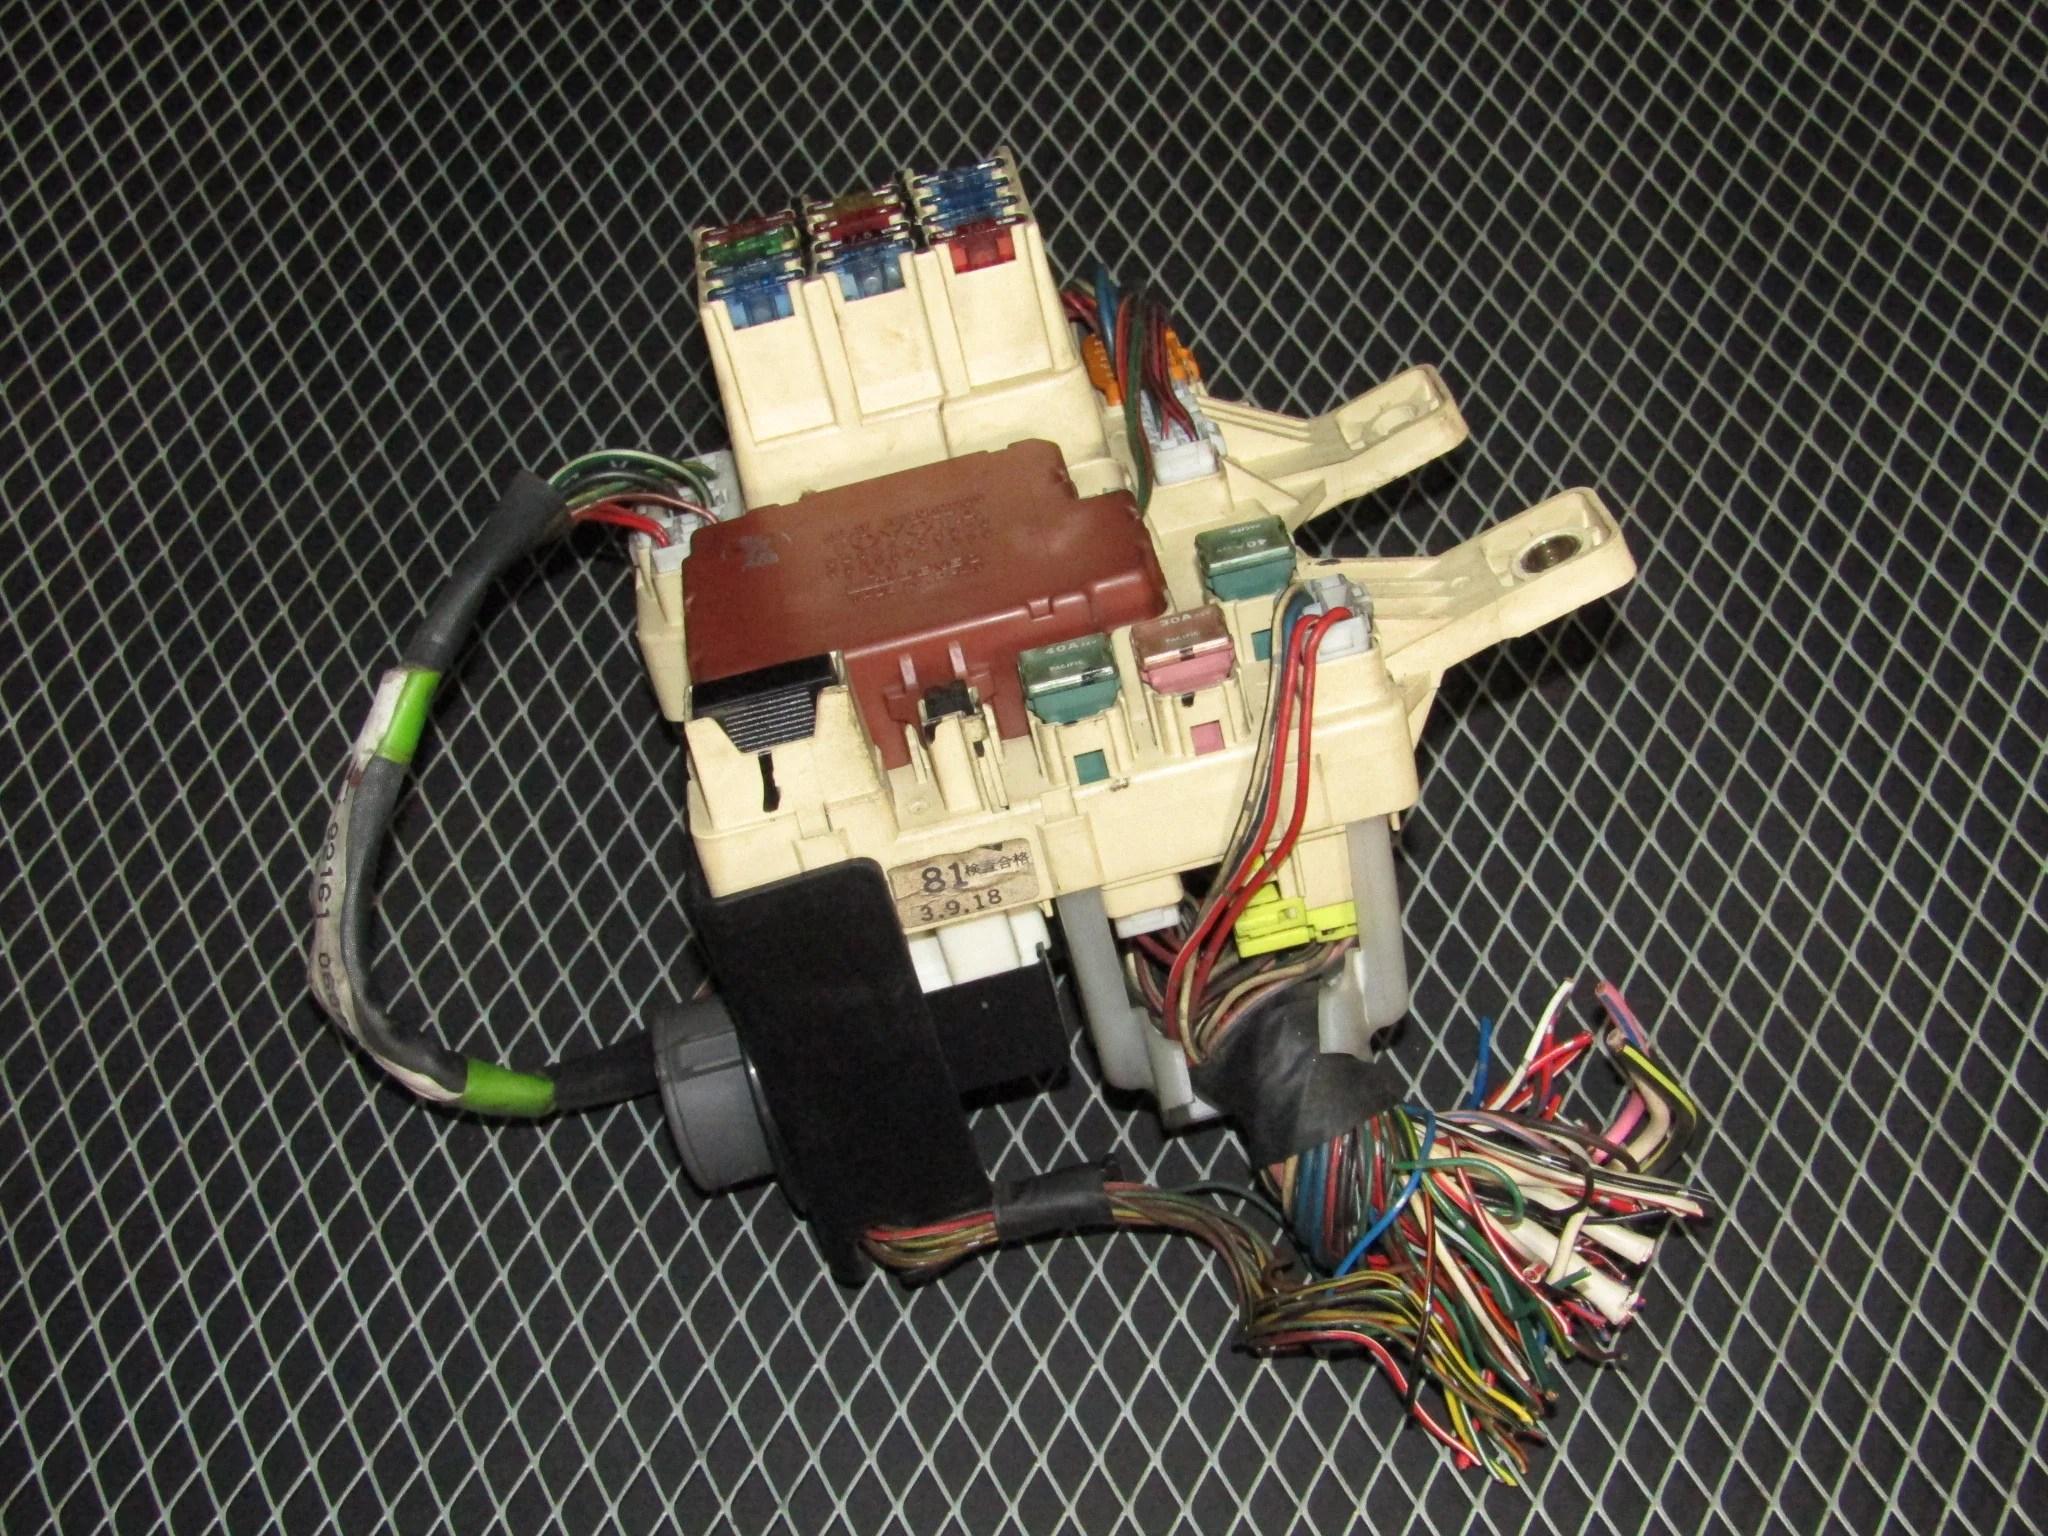 92 93 toyota camry oem interior fuse box 3vz fe v6  [ 2048 x 1536 Pixel ]